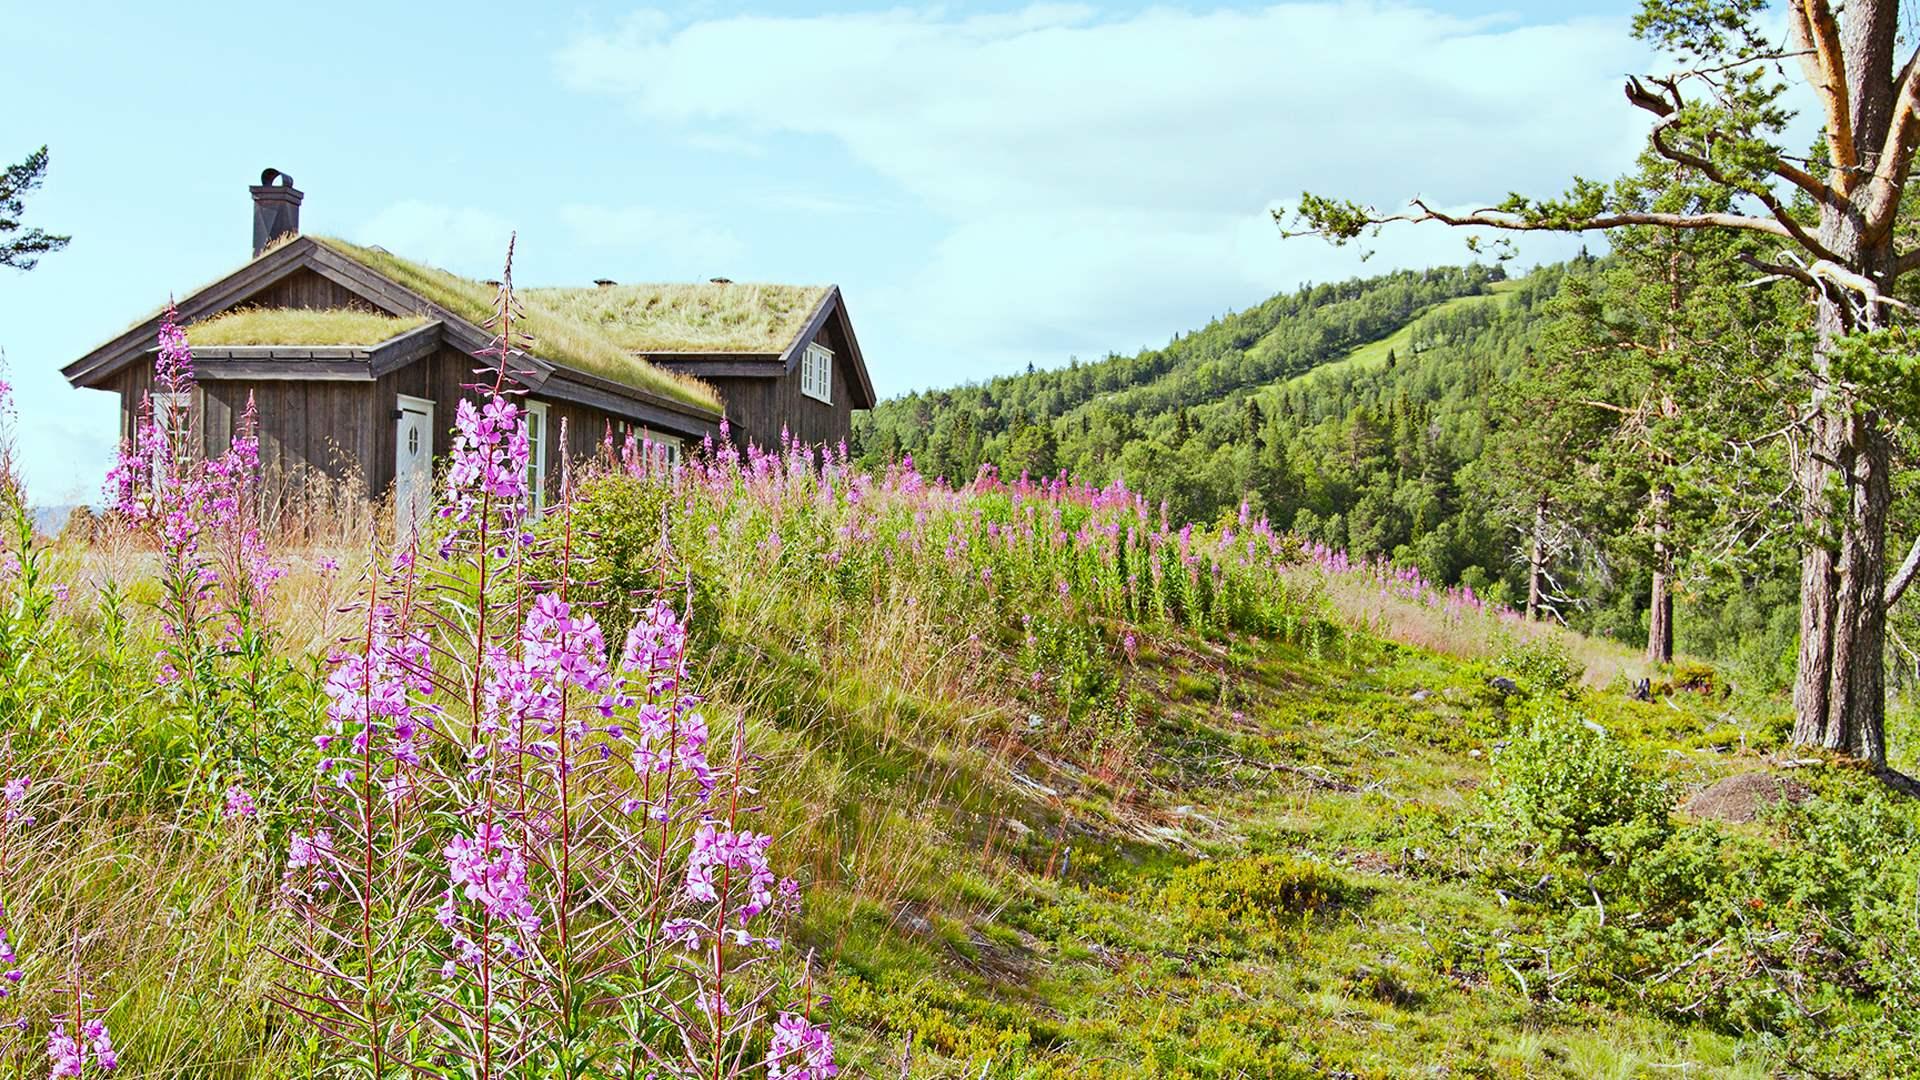 Holtardalen i Rauland er et populært område som stadig utvides med nye hyttefelt.